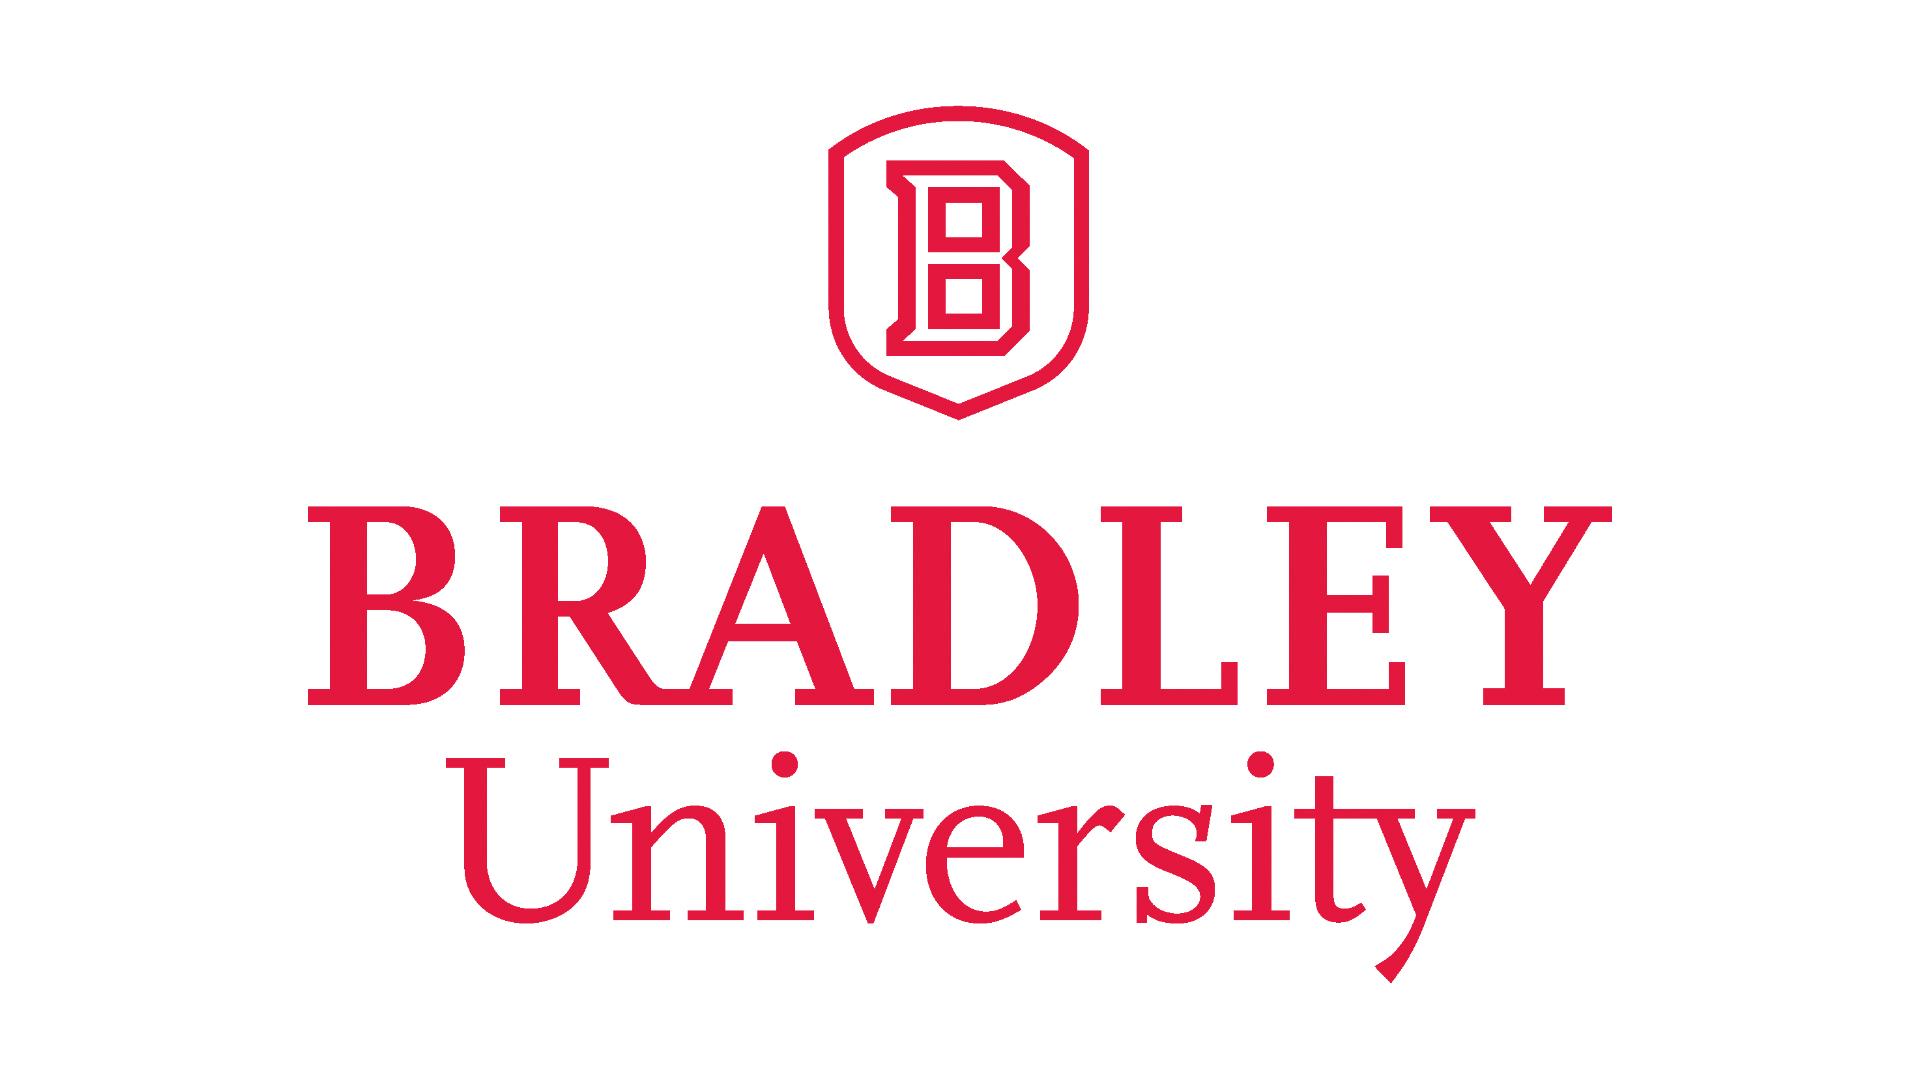 Founder Of Bradley University Tops List Of Groundbreaking Illinois Women